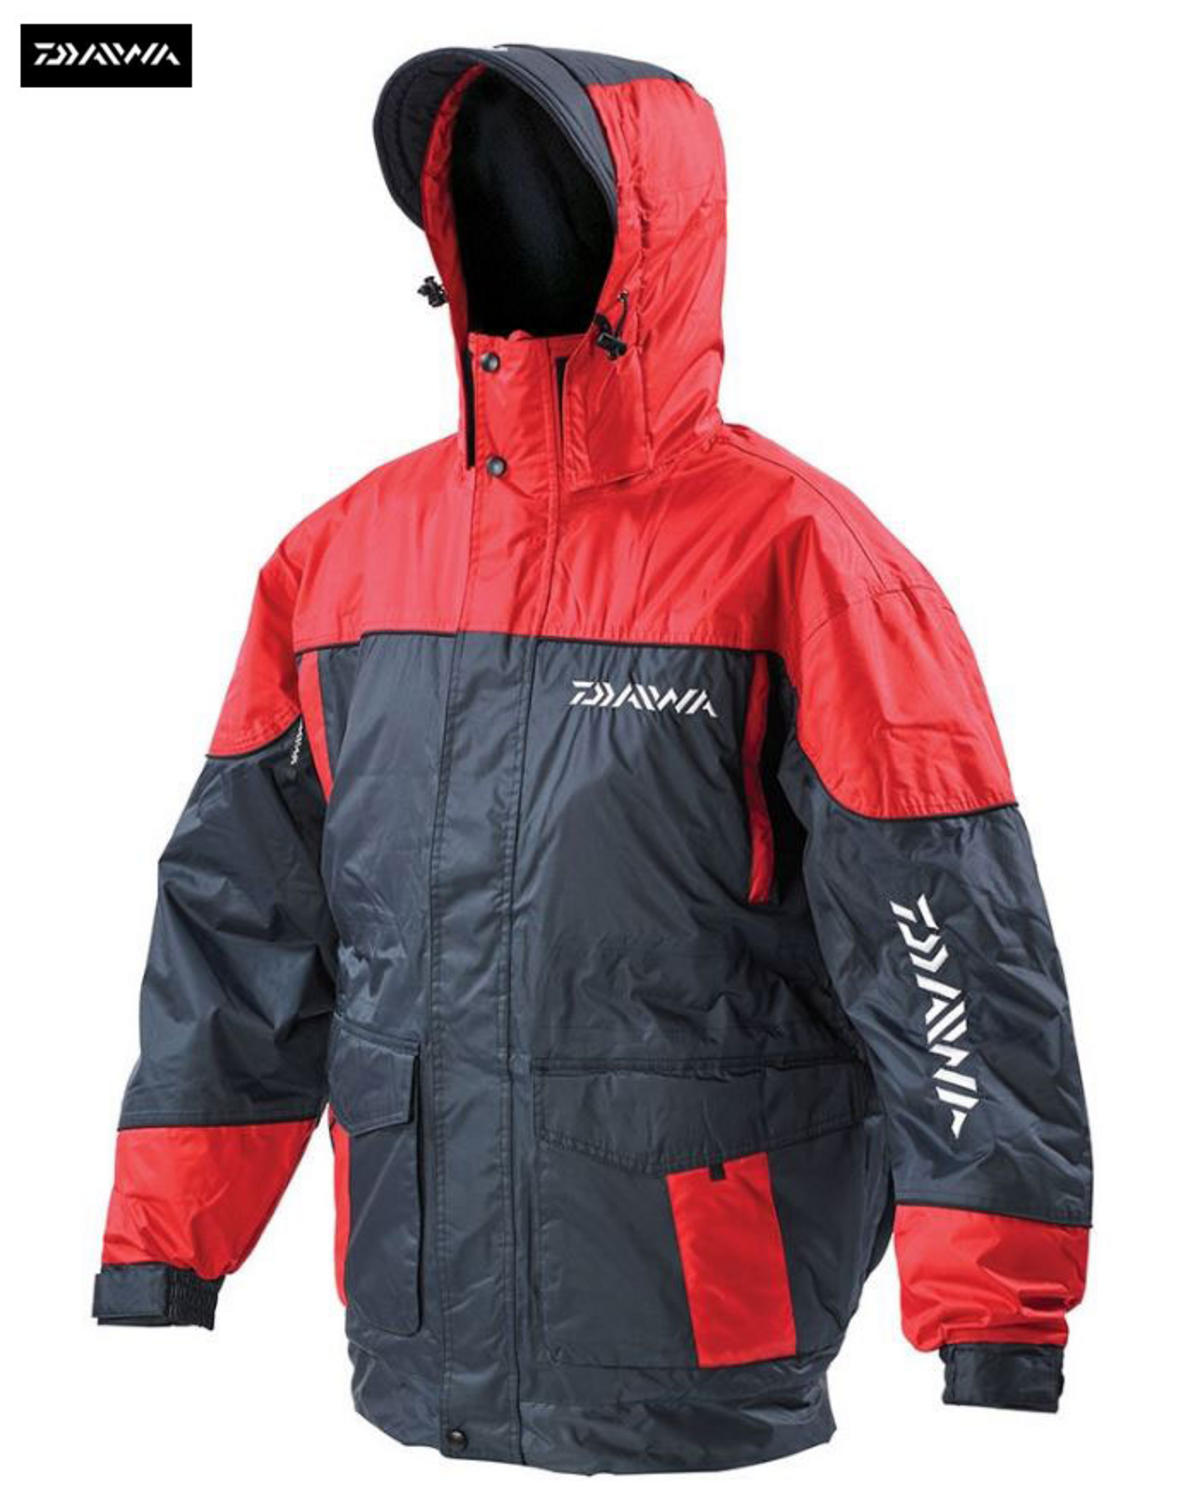 New Daiwa Thermal Stormbeach Jacket - All Sizes Available Model No. DSBTJ